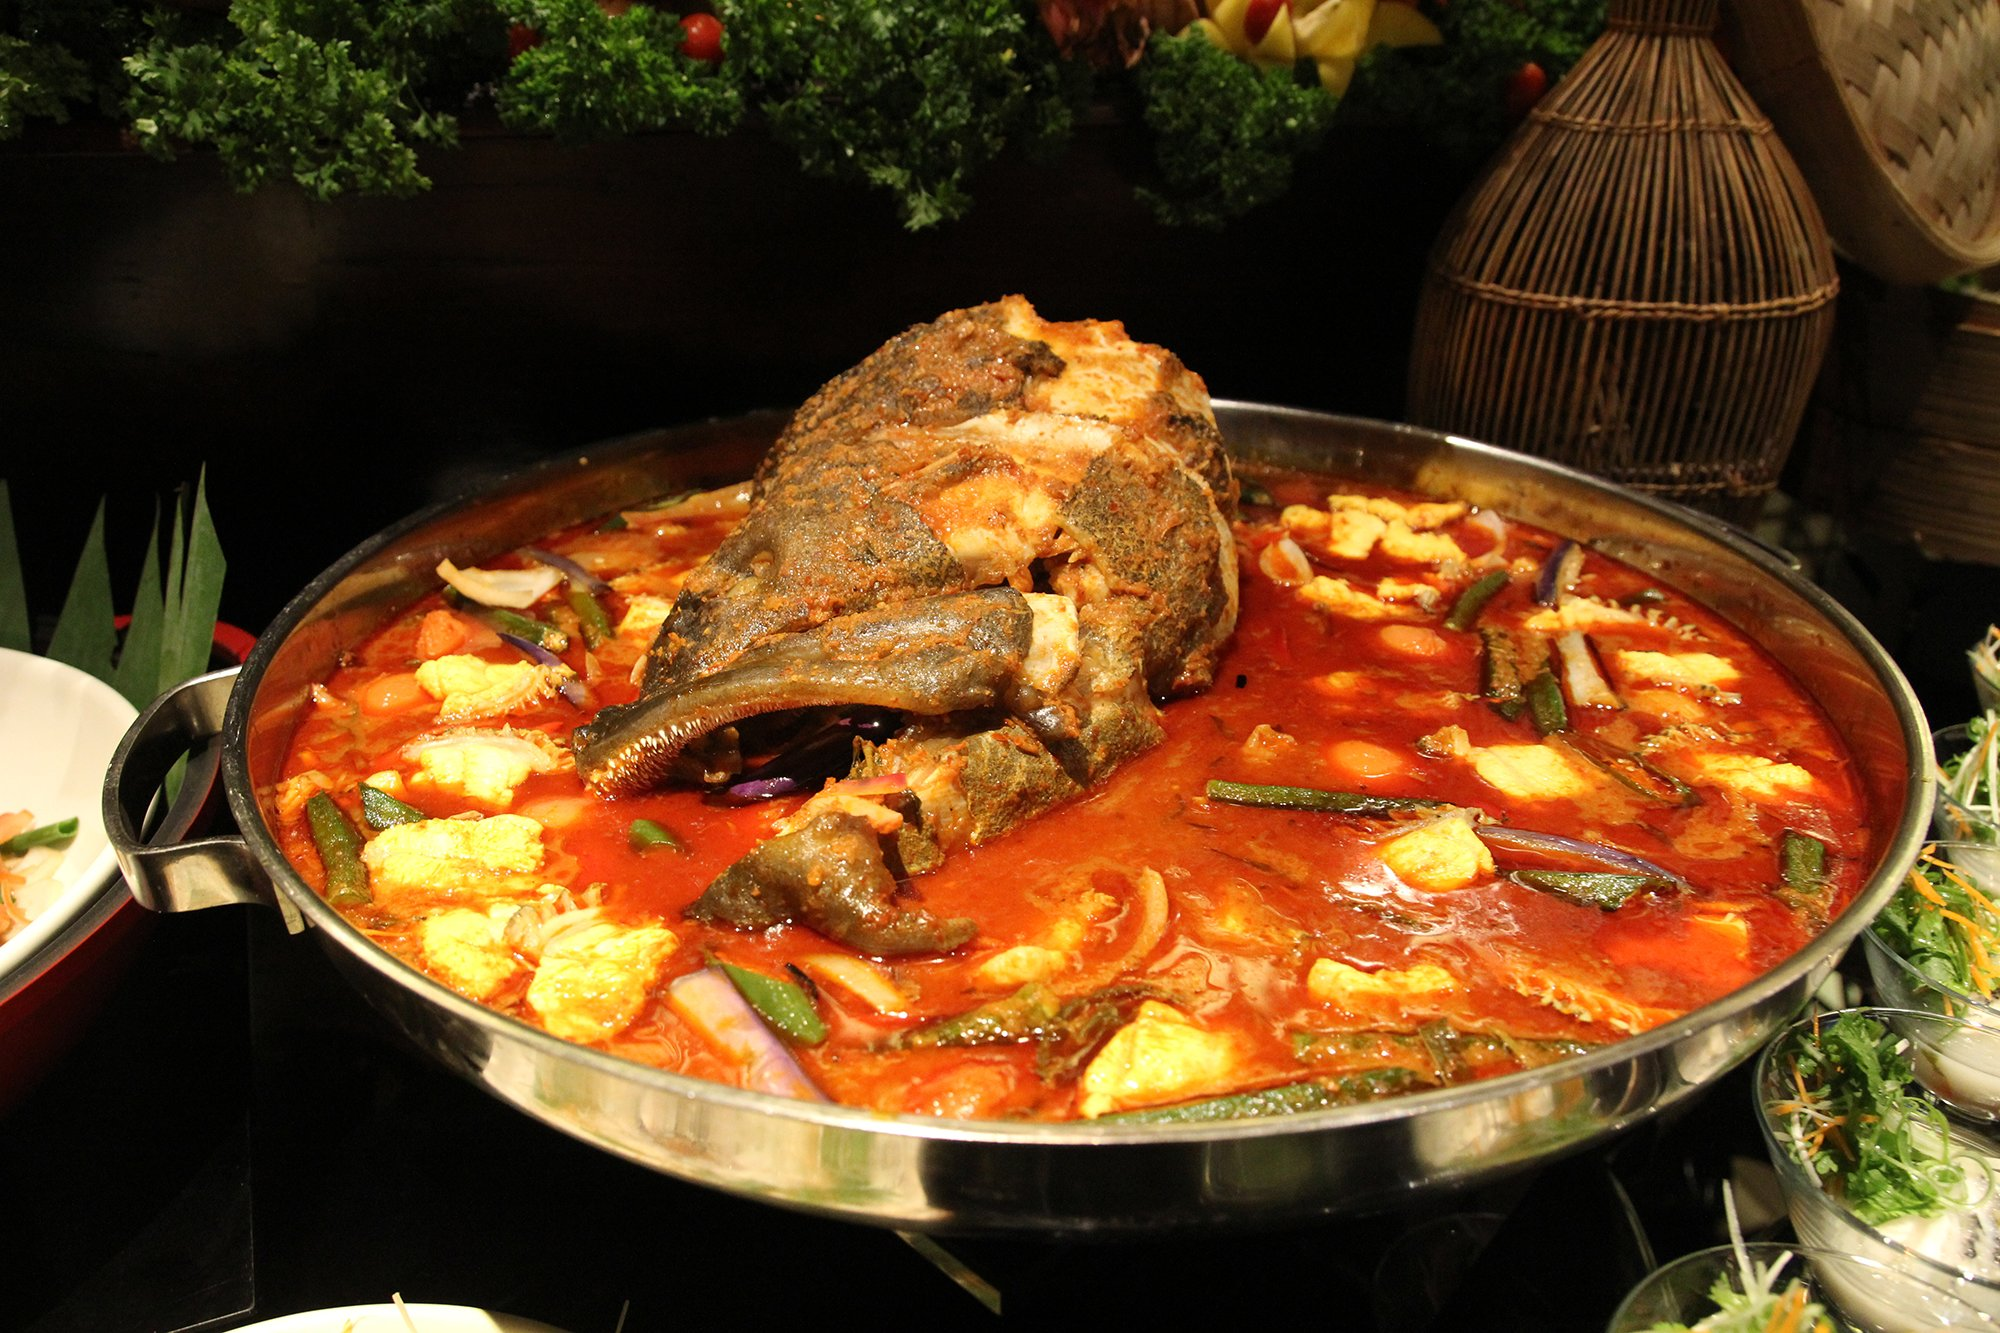 doubletreebyhiltonkl_makan-kitchen_giant-estuary-grouper-in-asam-pedas-kawah-style